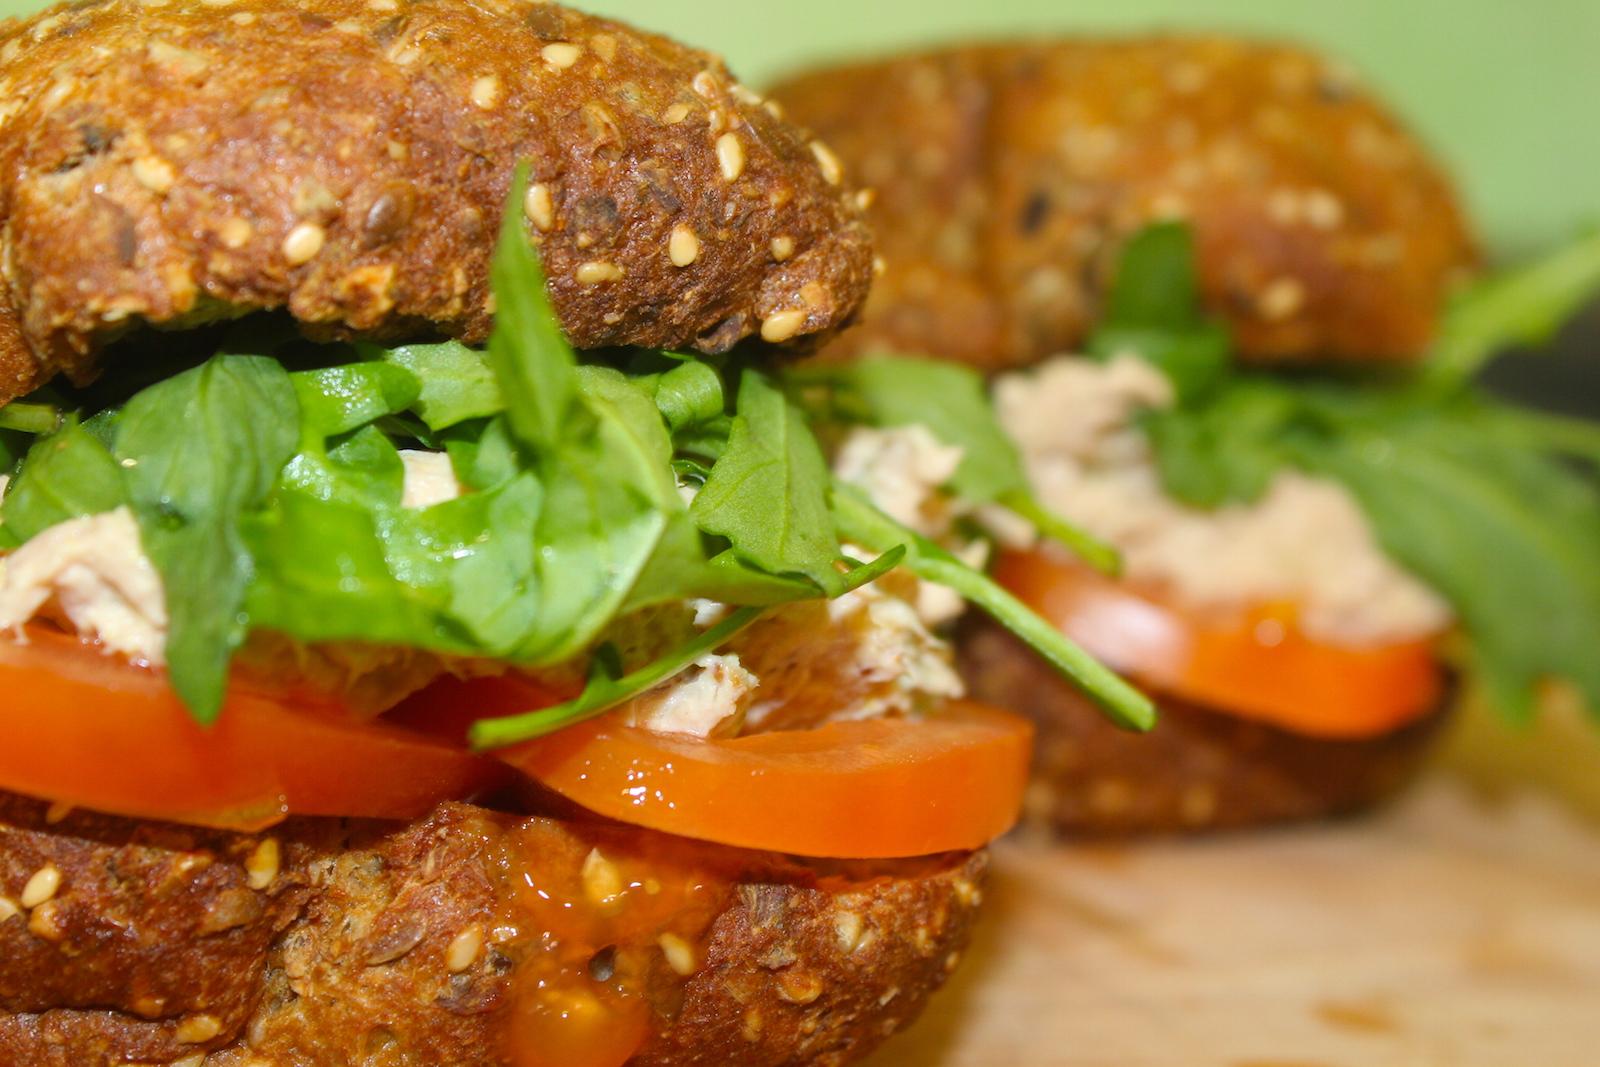 LCHF-сандвич с тунцом и кокосовым майонезом